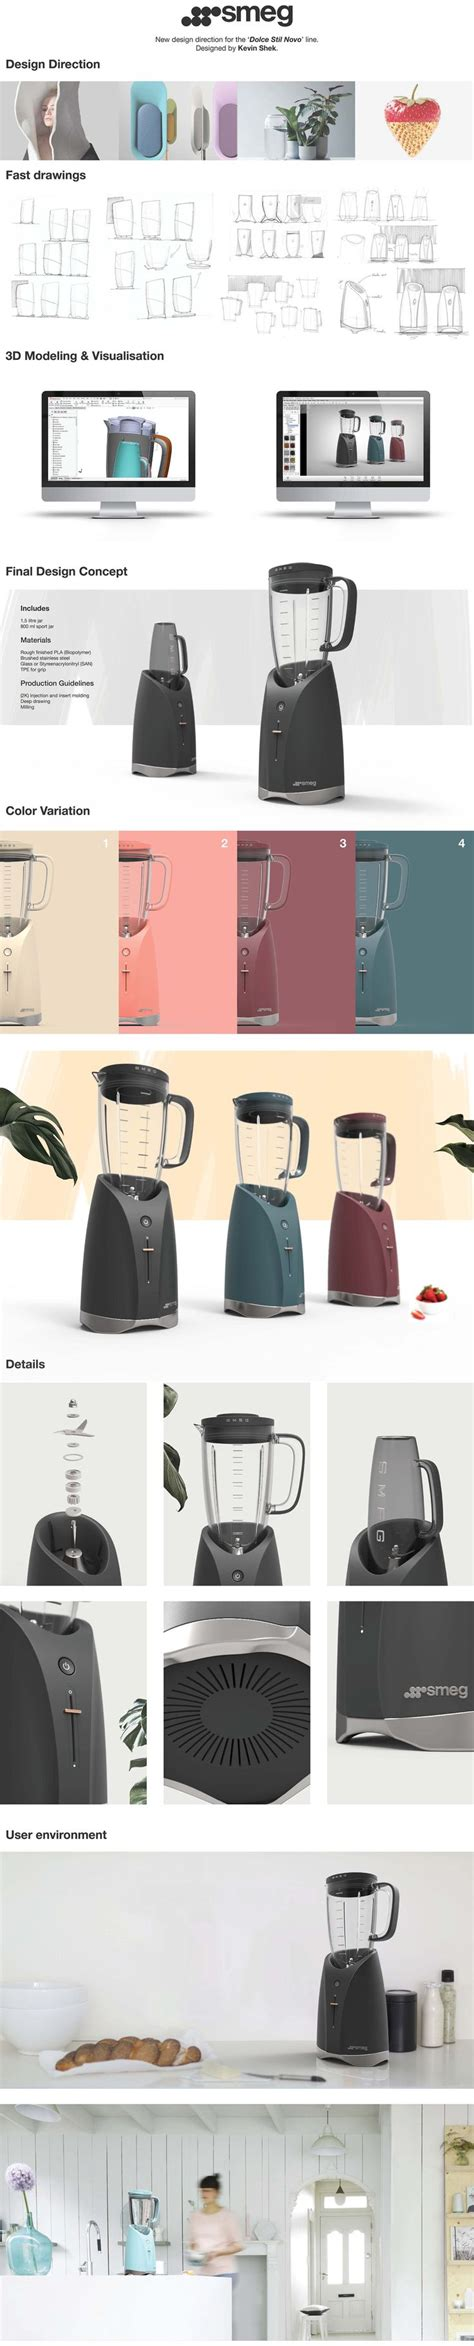 Product Design Portfolio 25 best ideas about industrial design portfolio on